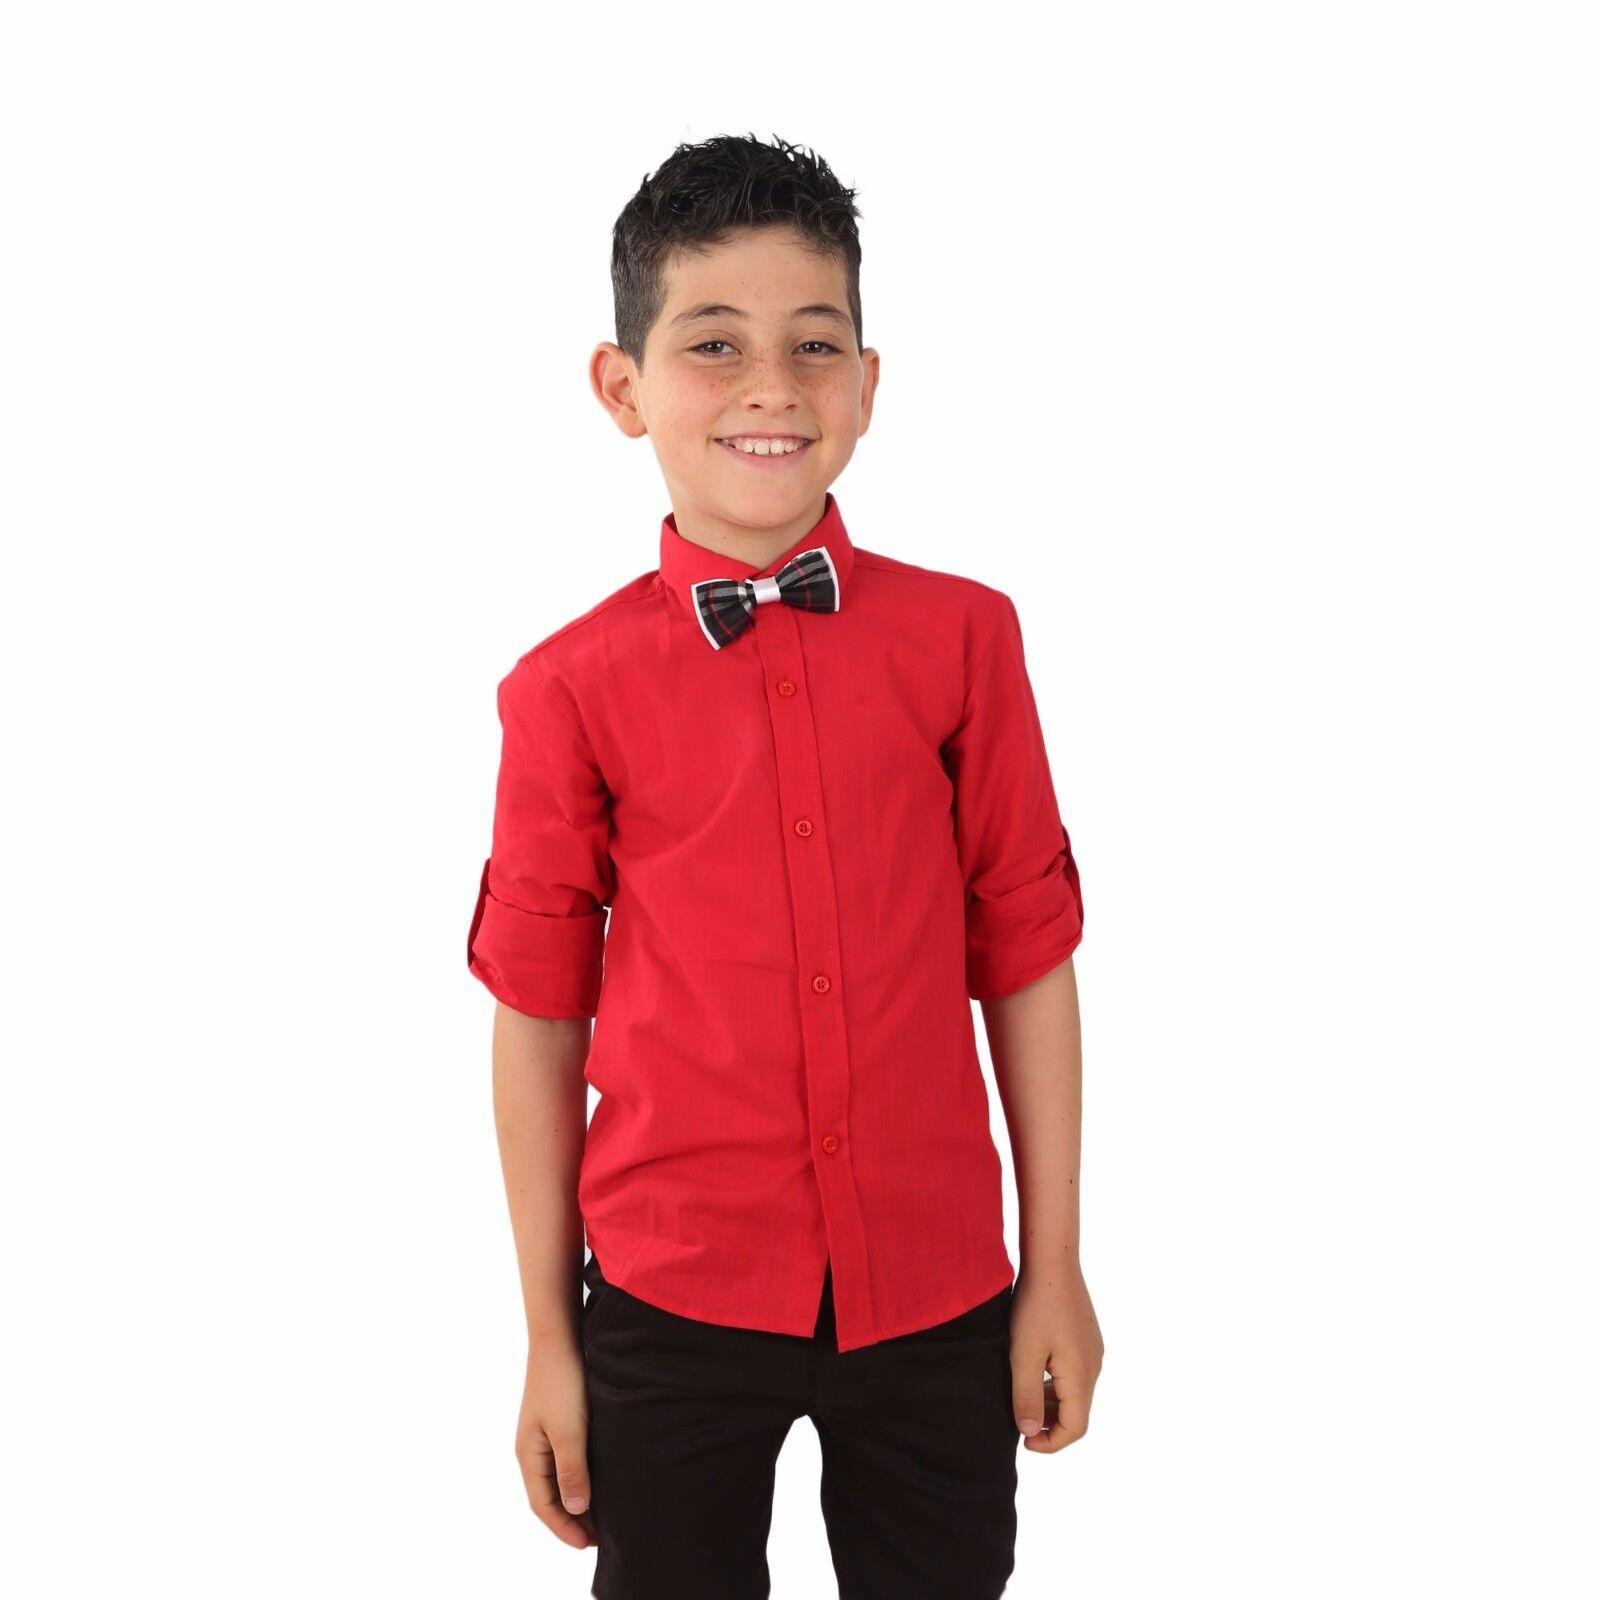 c2c634c28 Details about Boys Linen Red Shirts Kids Summer Long Sleeve Shirts Roll Up  Sleeve Boy Shirt